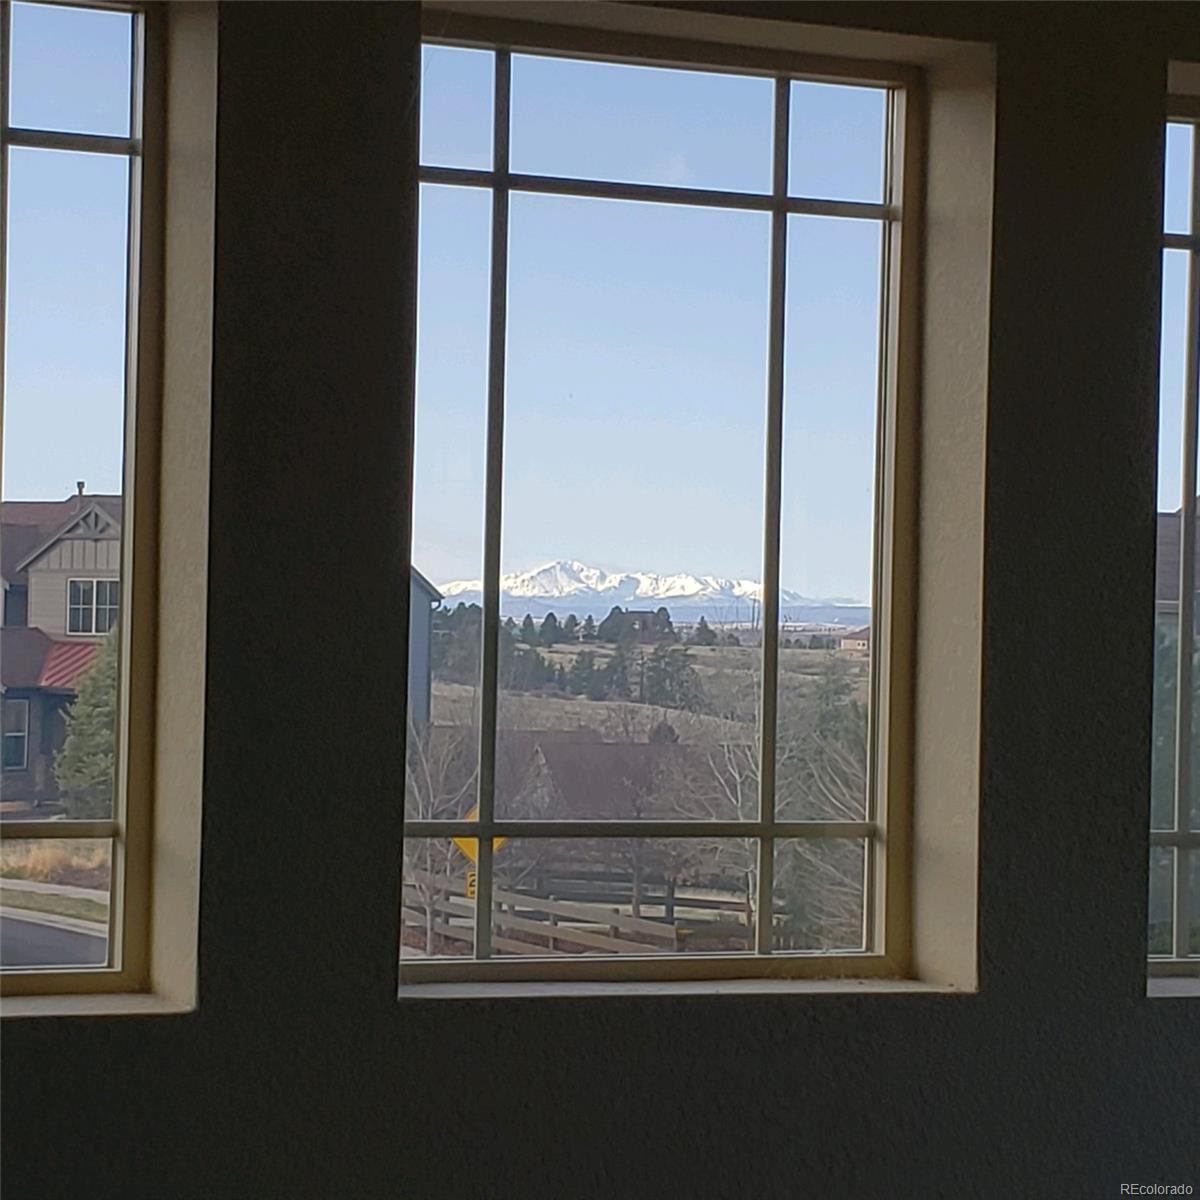 Wonderful views of Pike's Peak from Loft windows